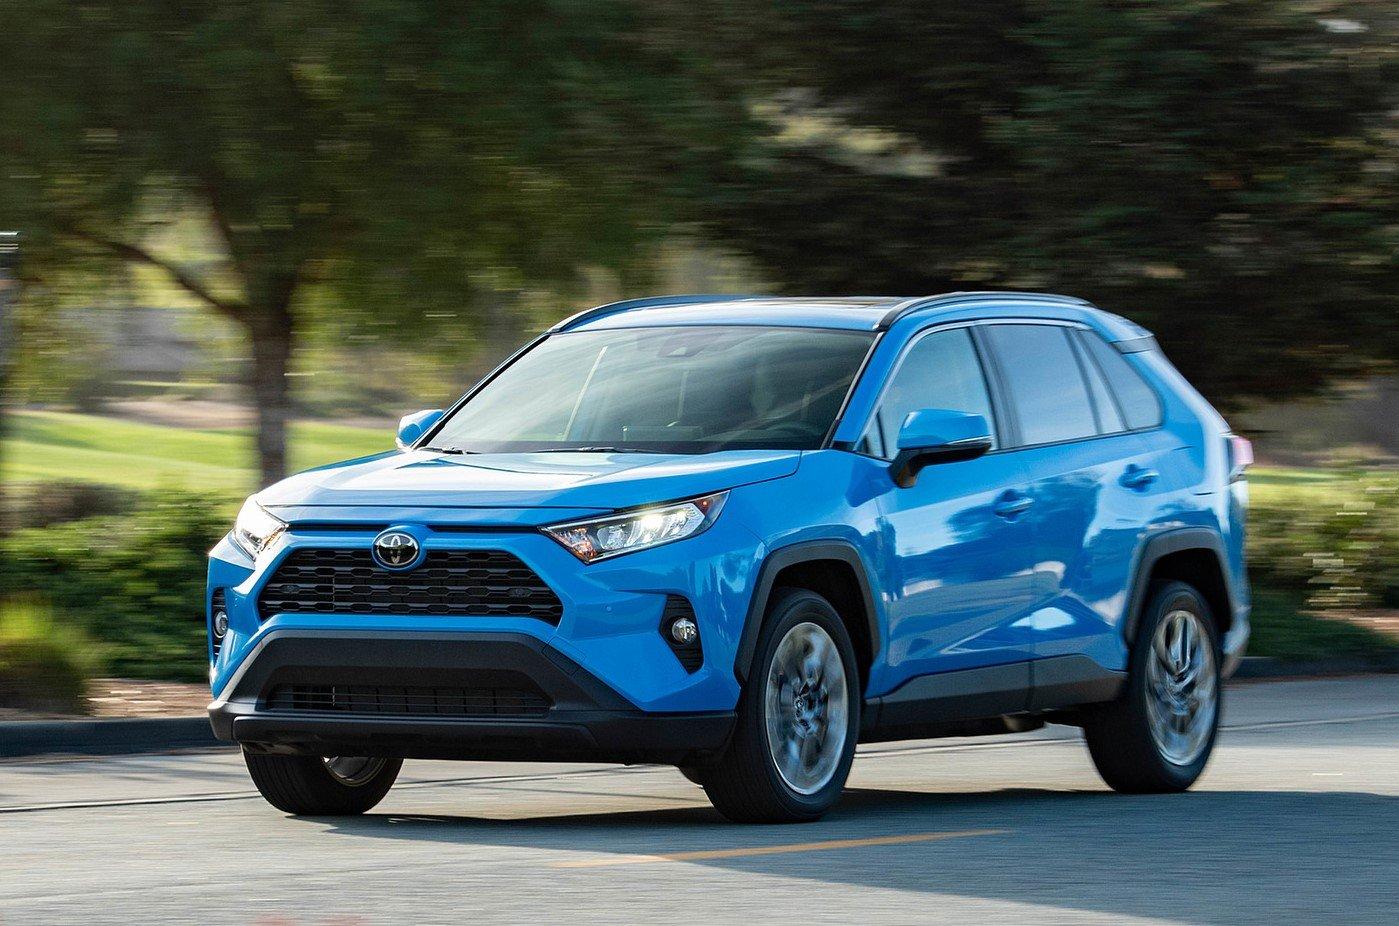 New-RAV4-Toyota-Towbars-2019-2020